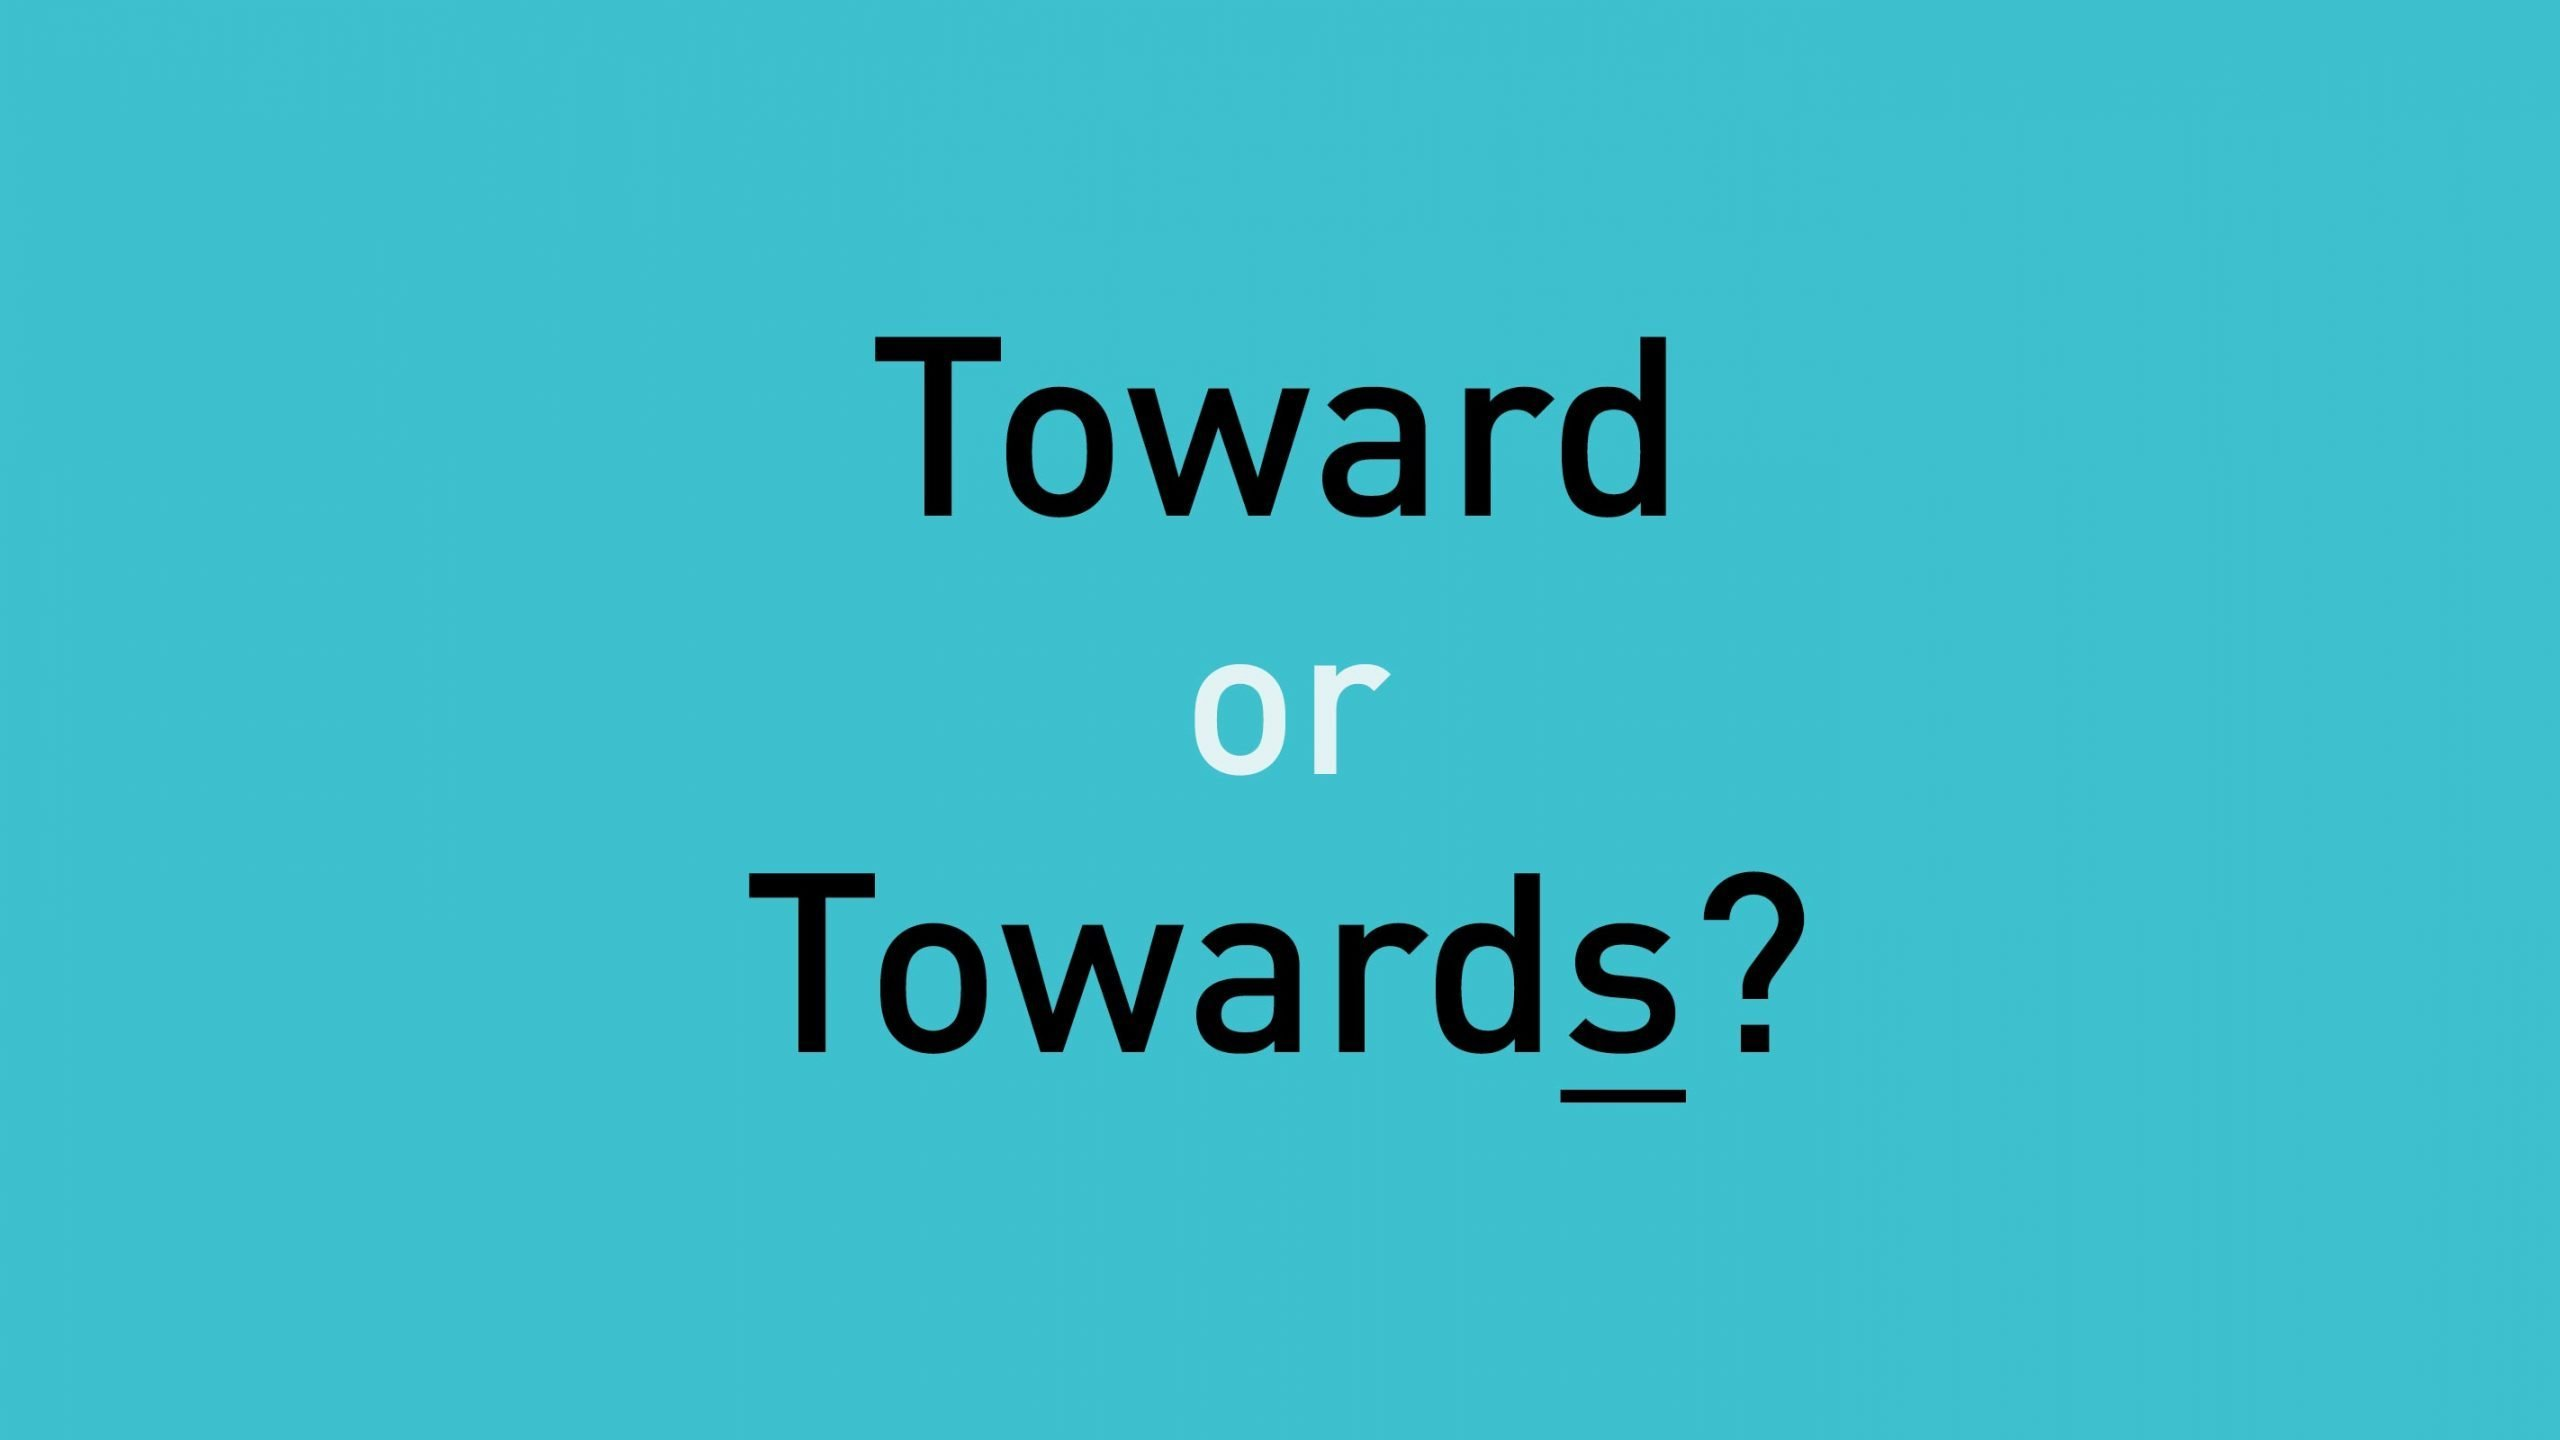 toward or towards?